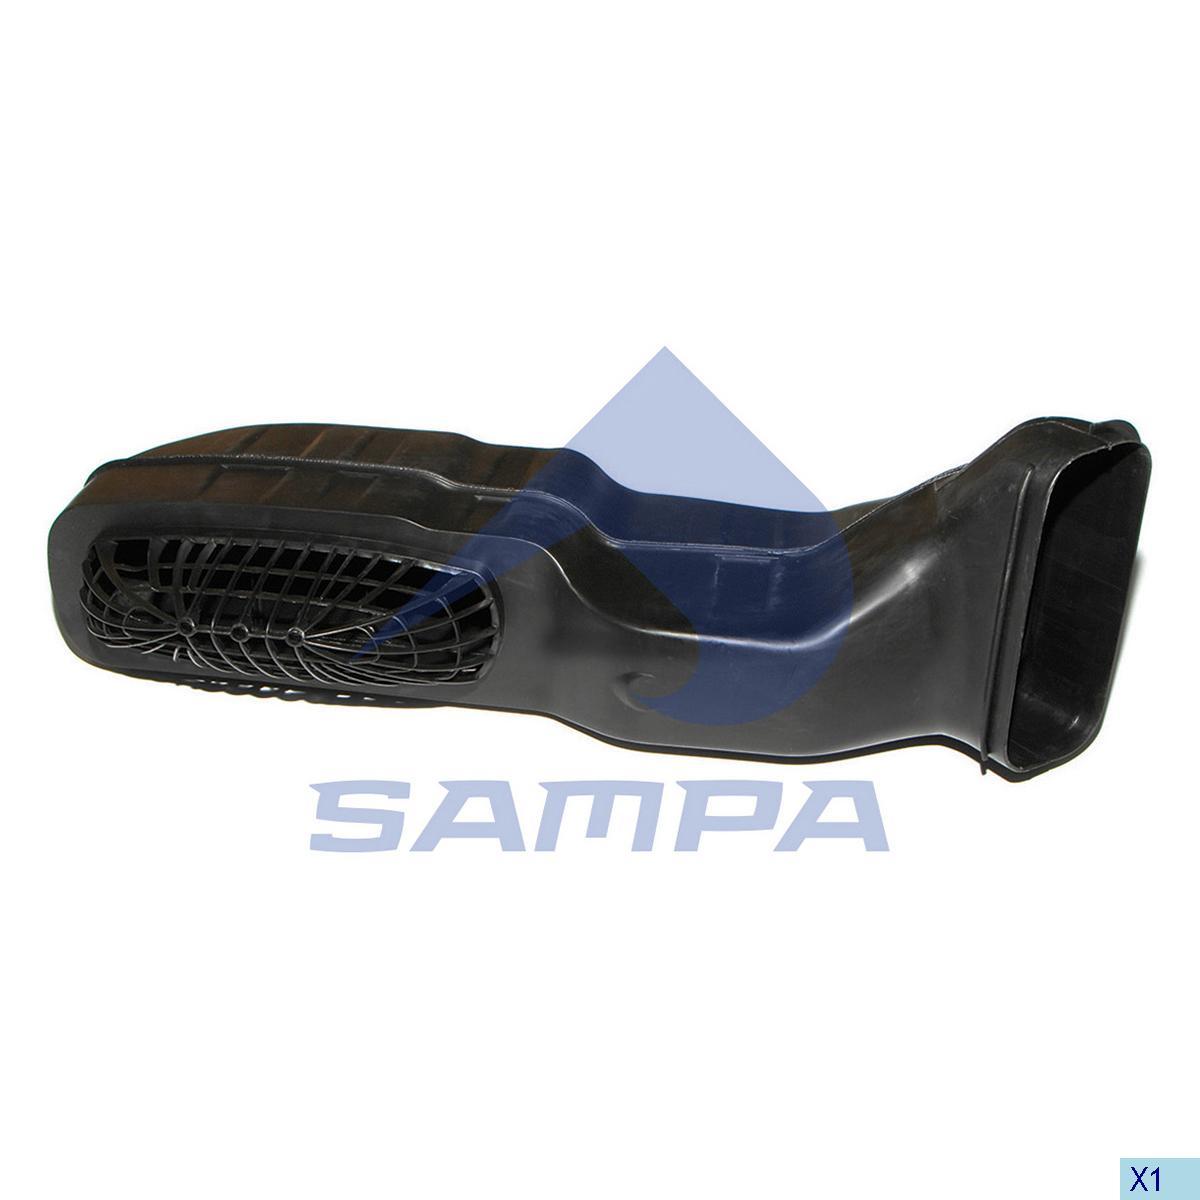 Air Duct, Air Filter, Man, Engine